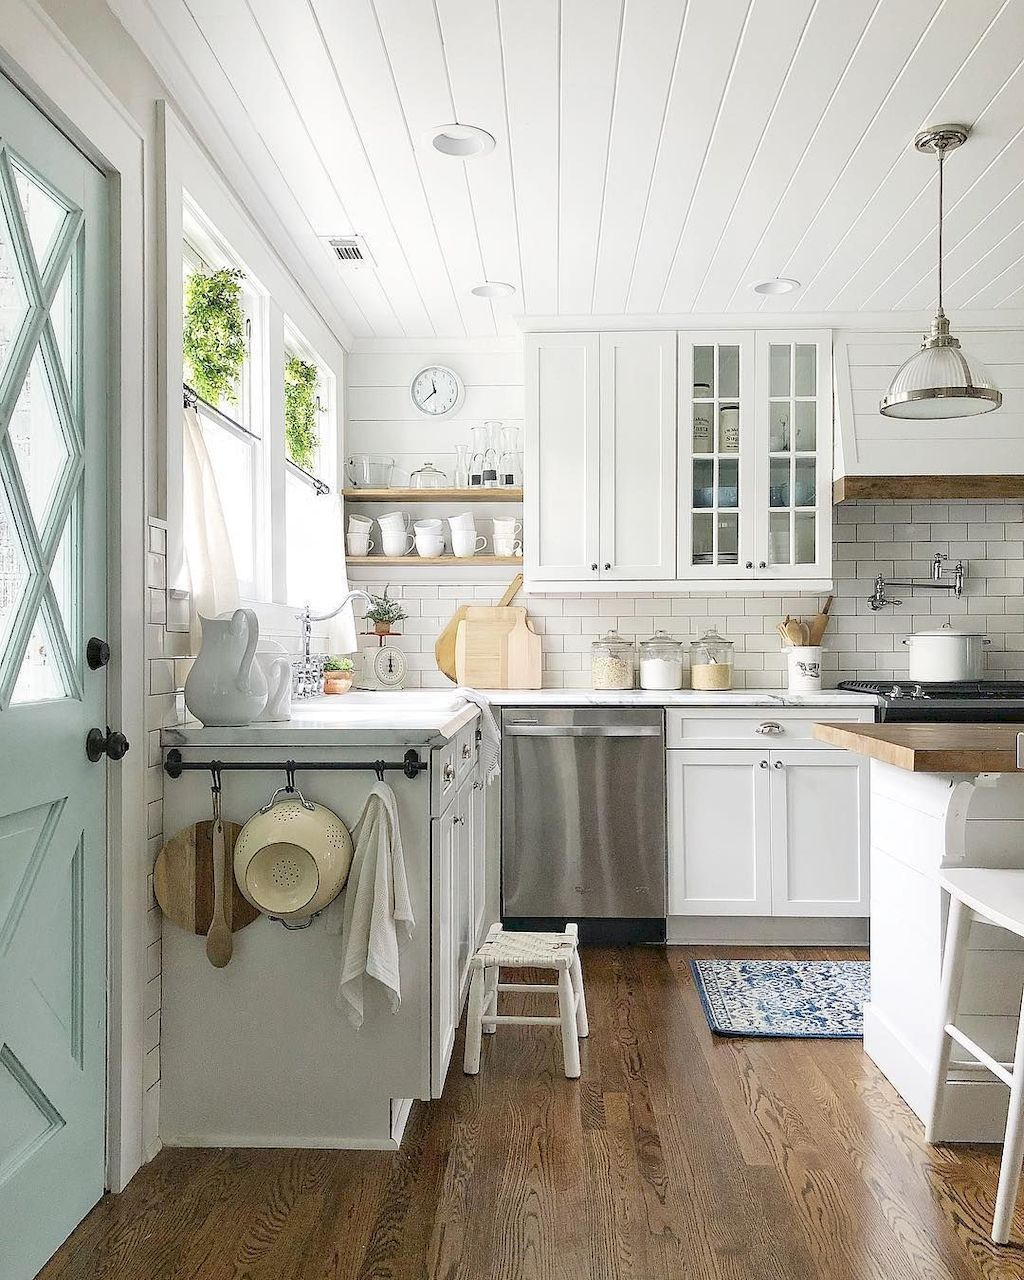 40 Modern Farmhouse Kitchen Cabinets Decor Ideas And Makeover Home Decor Farmhouse Style Kitchen Cabinets Farmhouse Kitchen Decor Kitchen Cabinets Decor